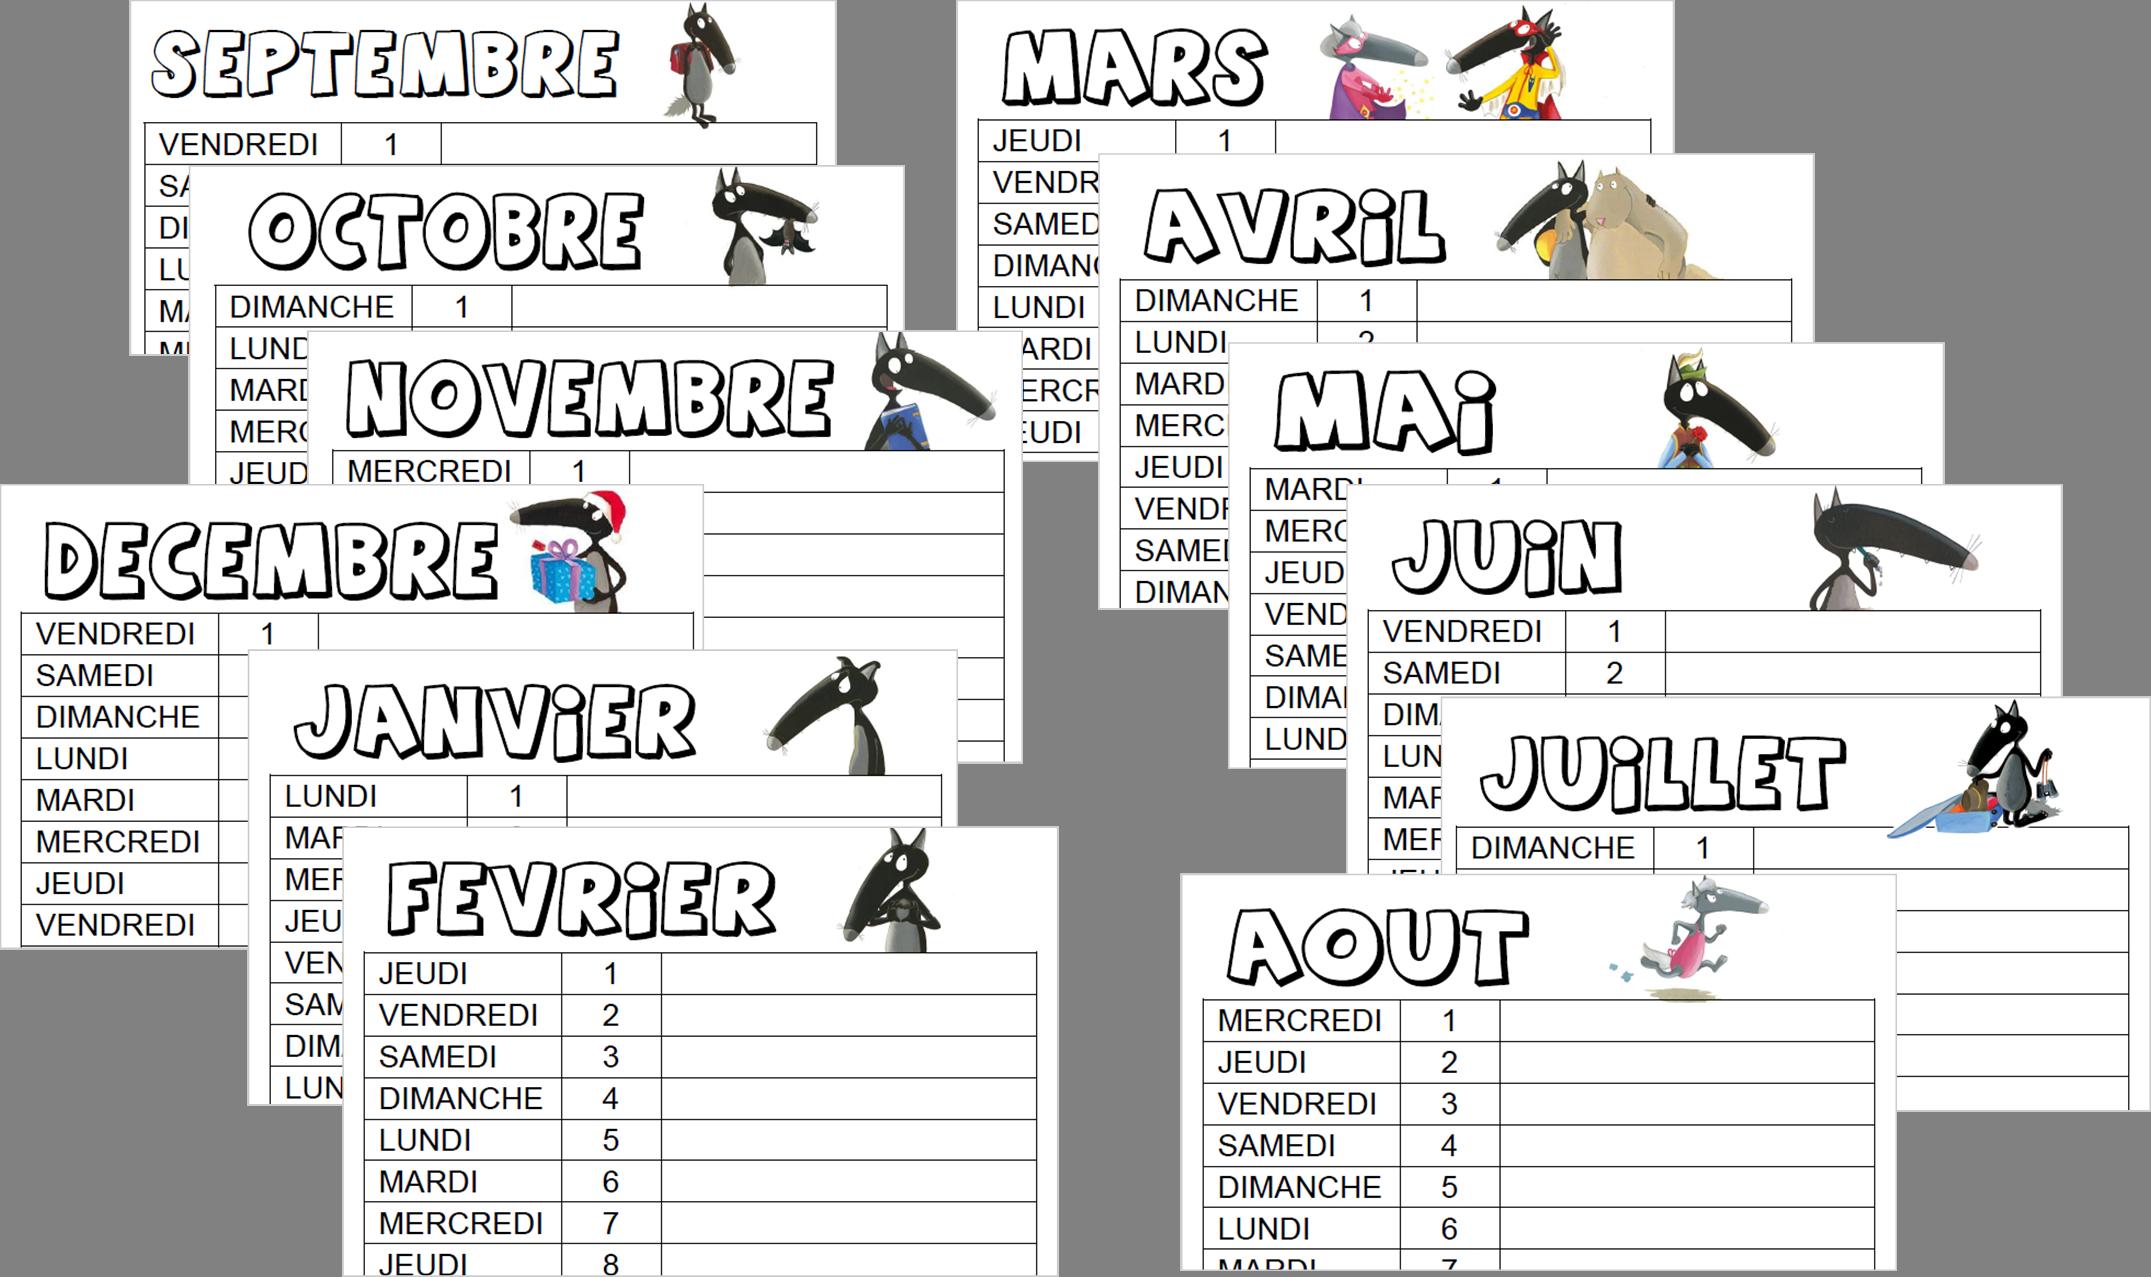 Calendrier 2018 2019 le loup le loup pinterest calendrier 2017 2018 calendrier 2018 - Modele de loup a imprimer ...